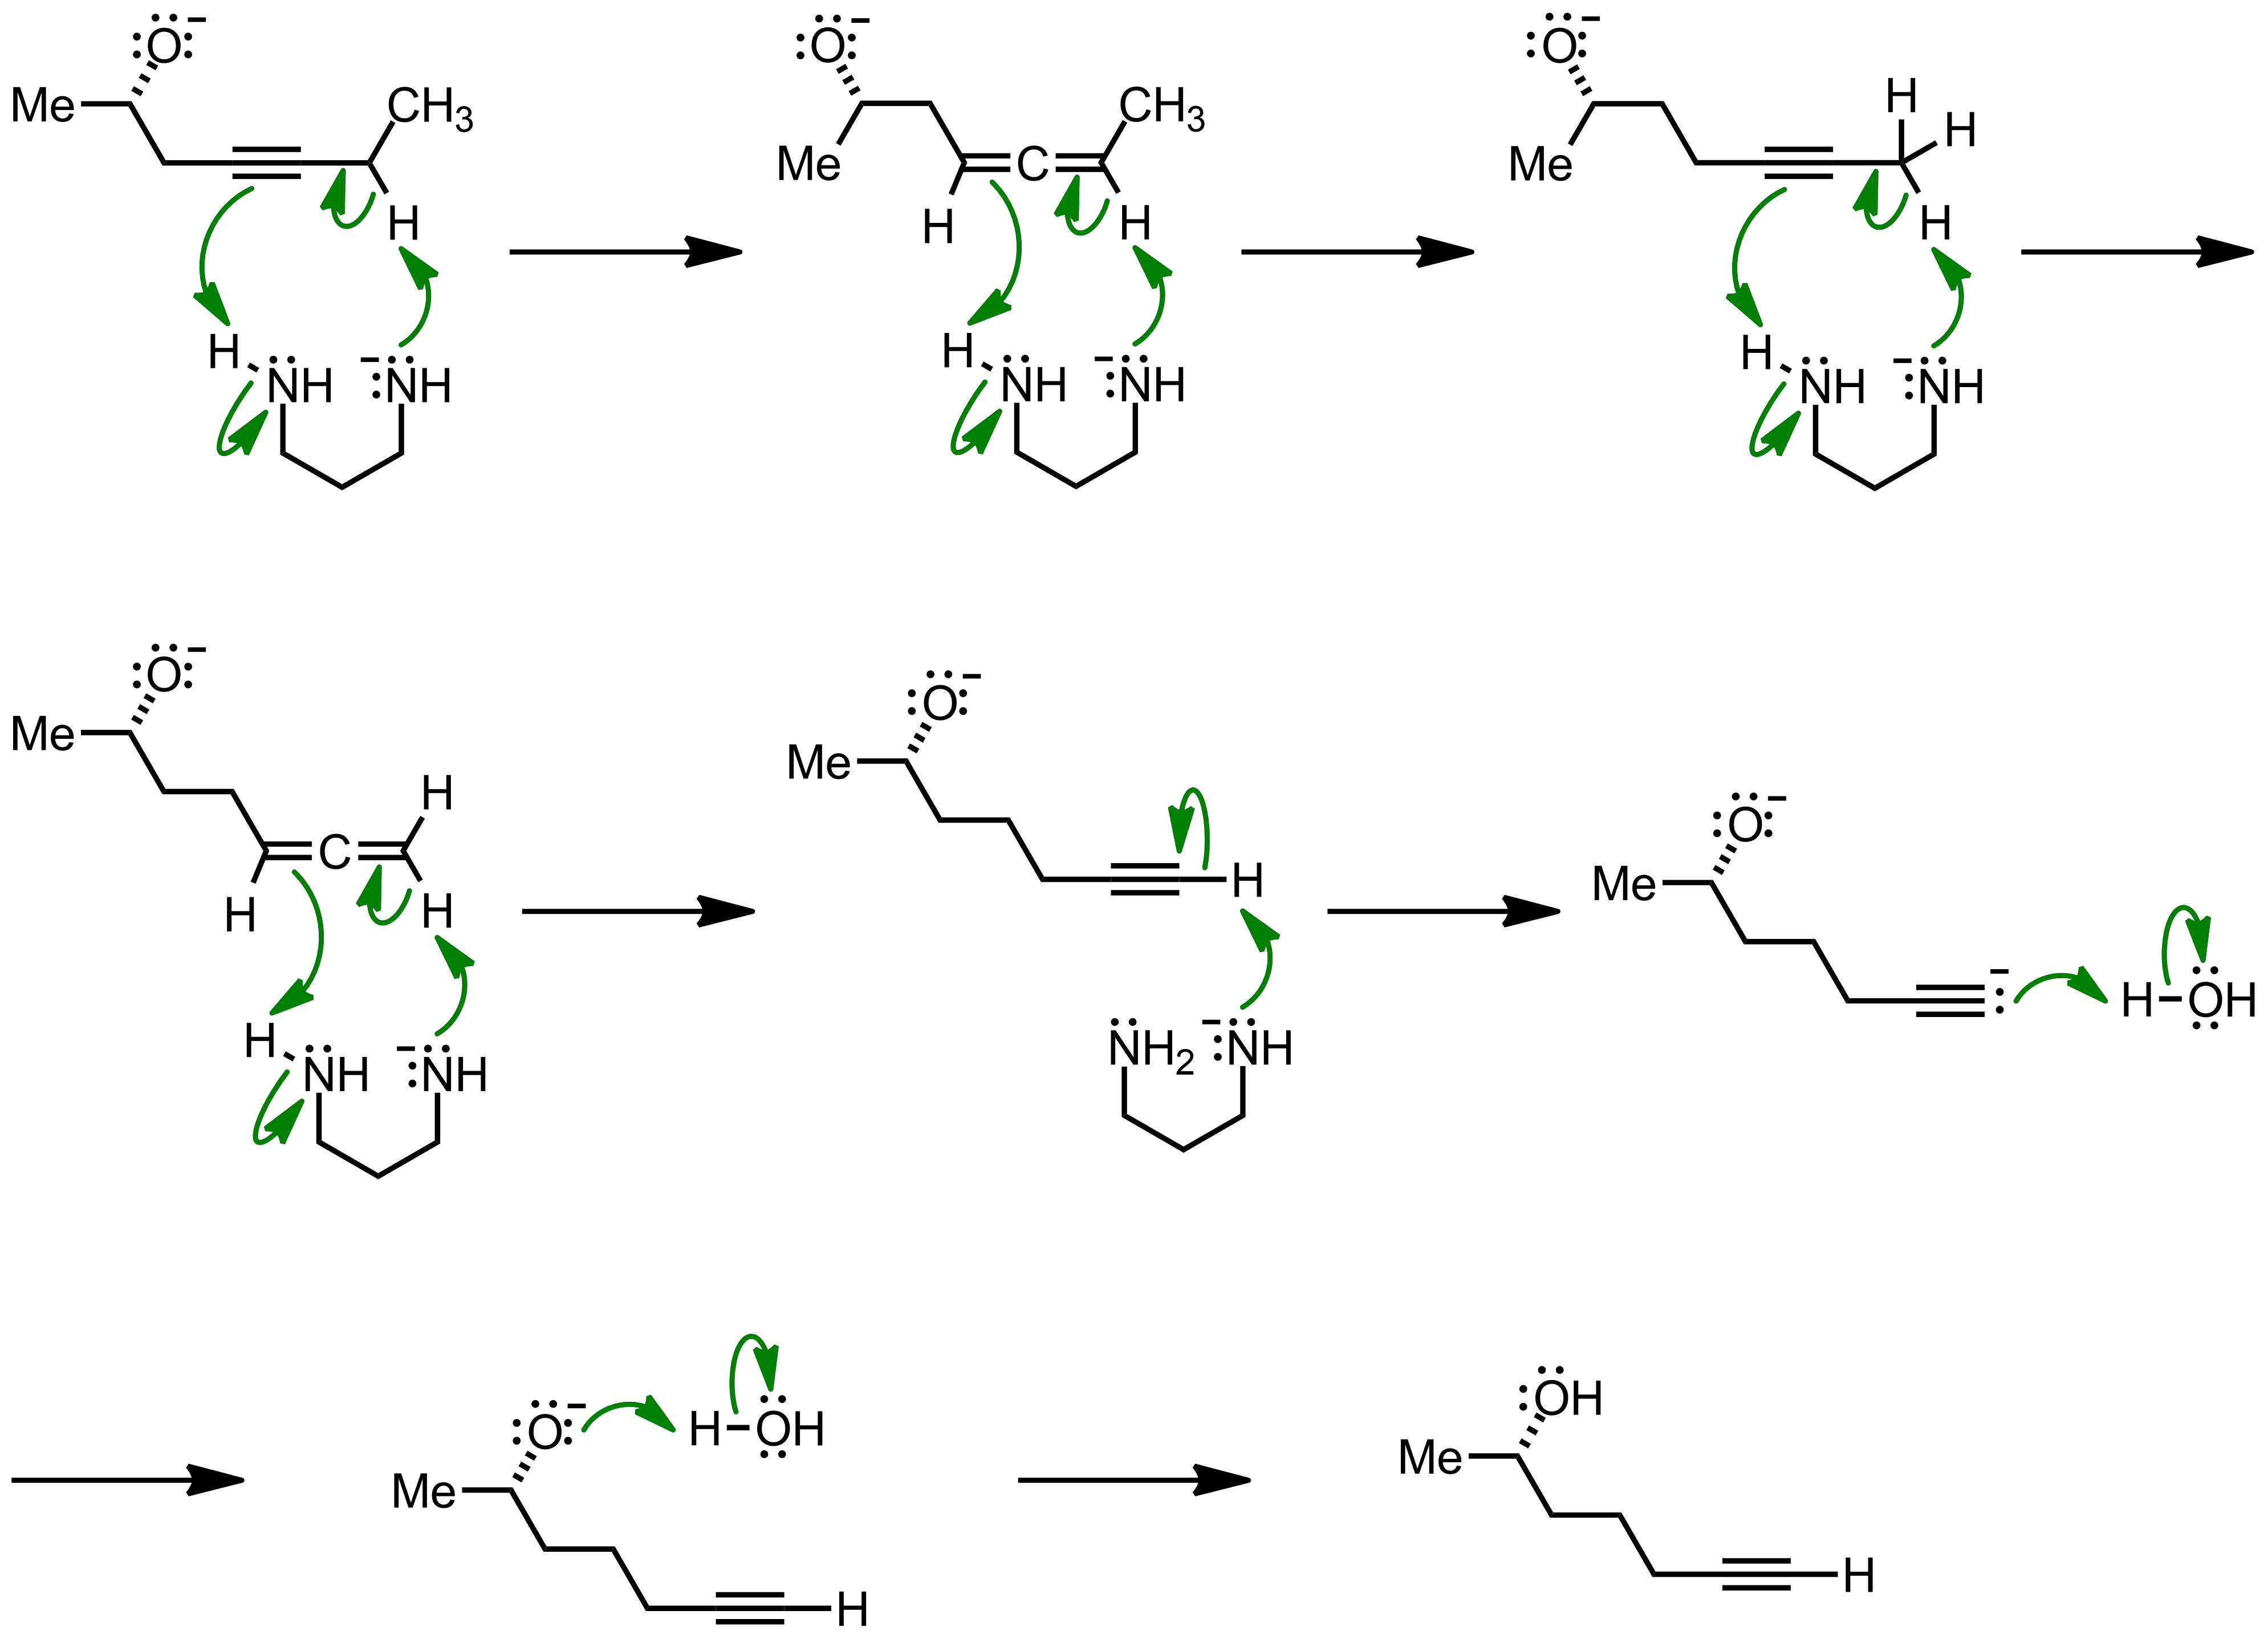 Mechanism of the Alkyne Zipper Reaction